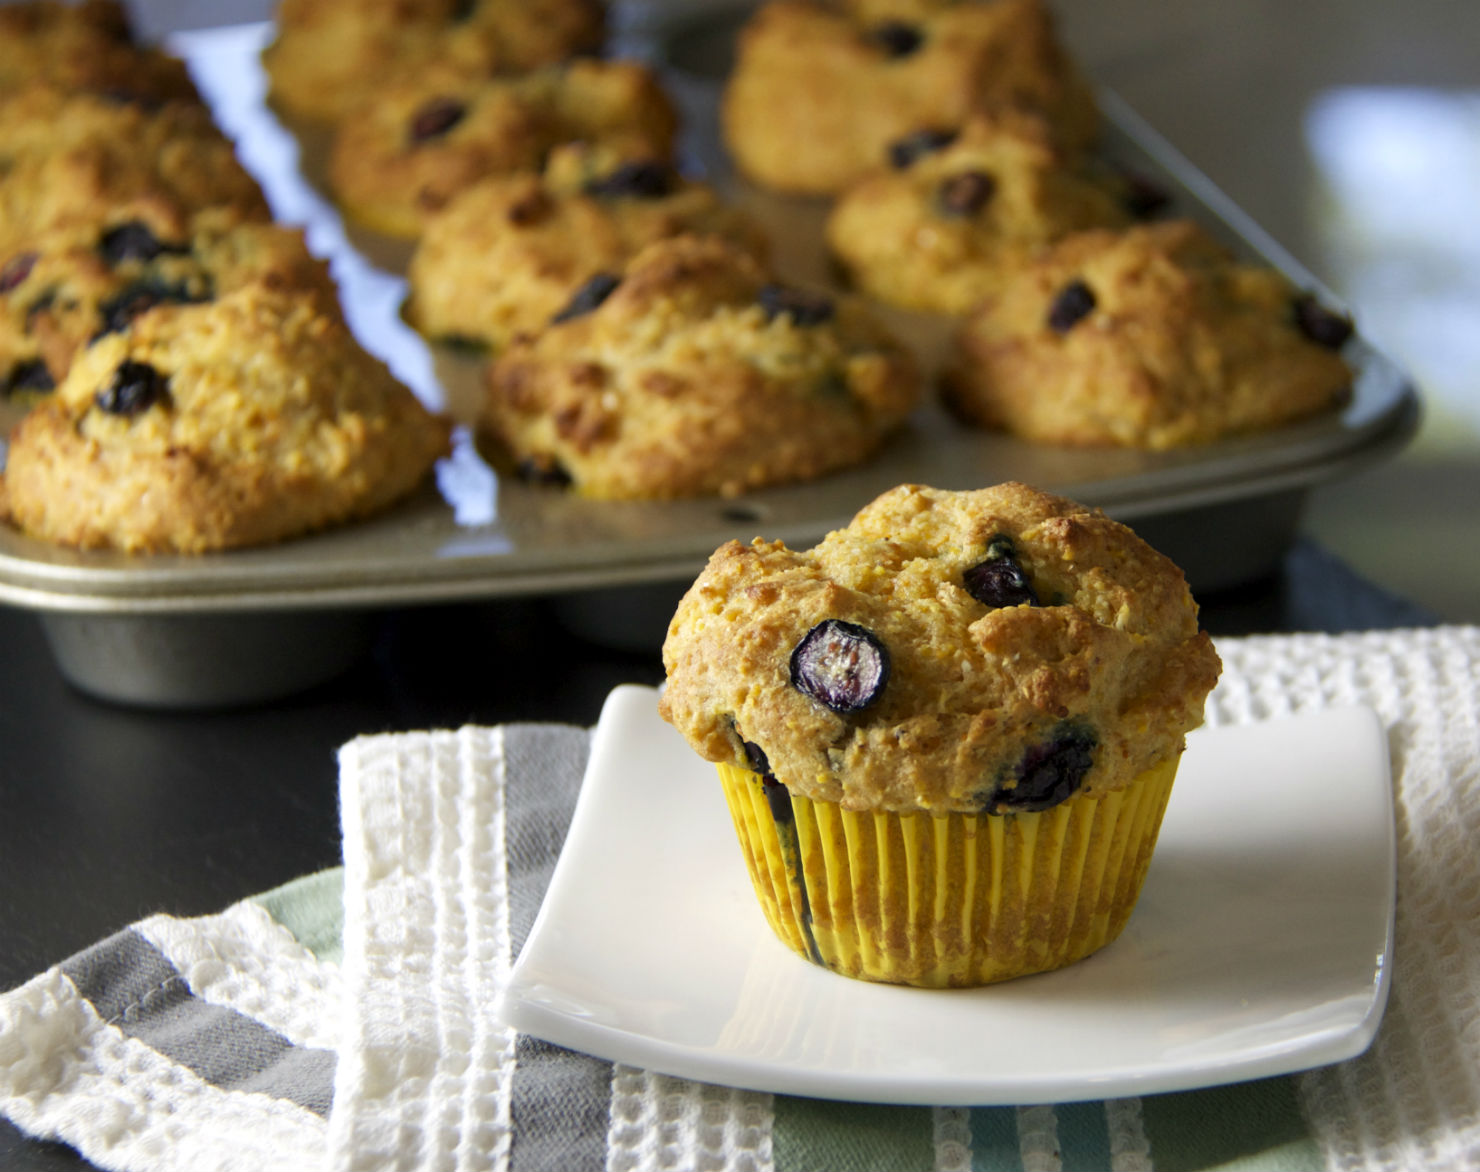 Blueberry corn muffin